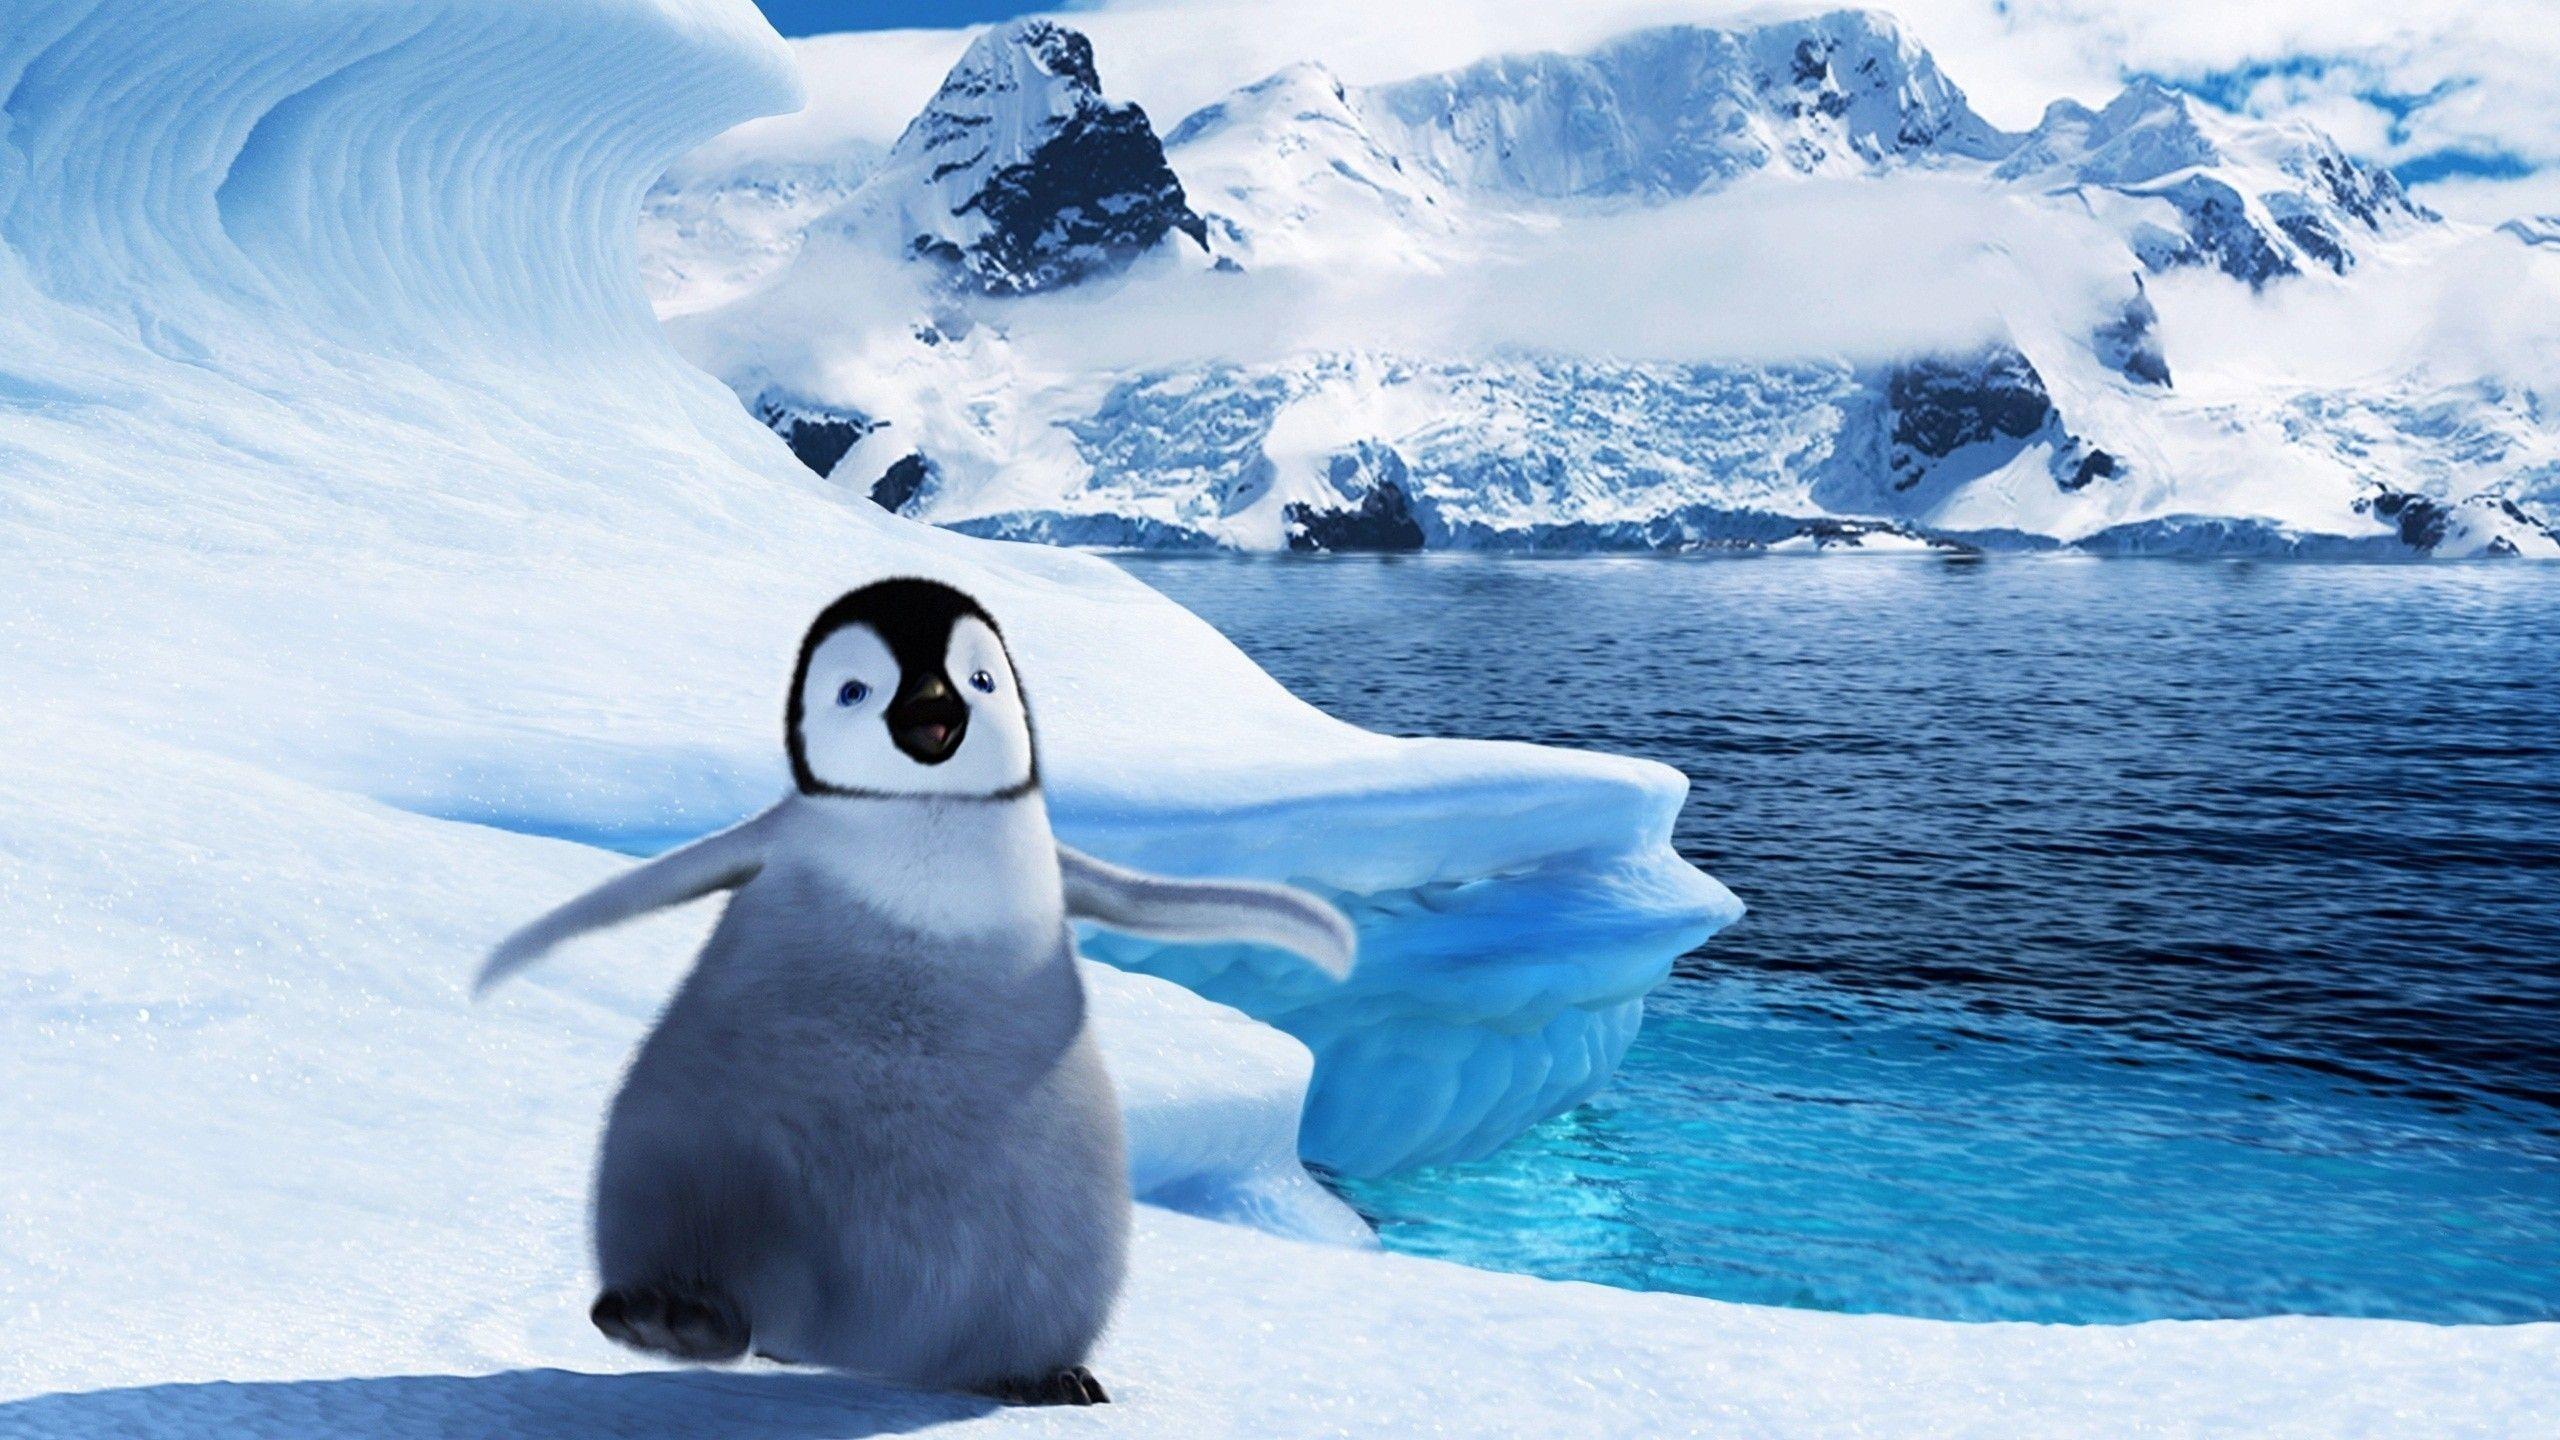 Cute Baby Penguin Wallpapers Top Free Cute Baby Penguin